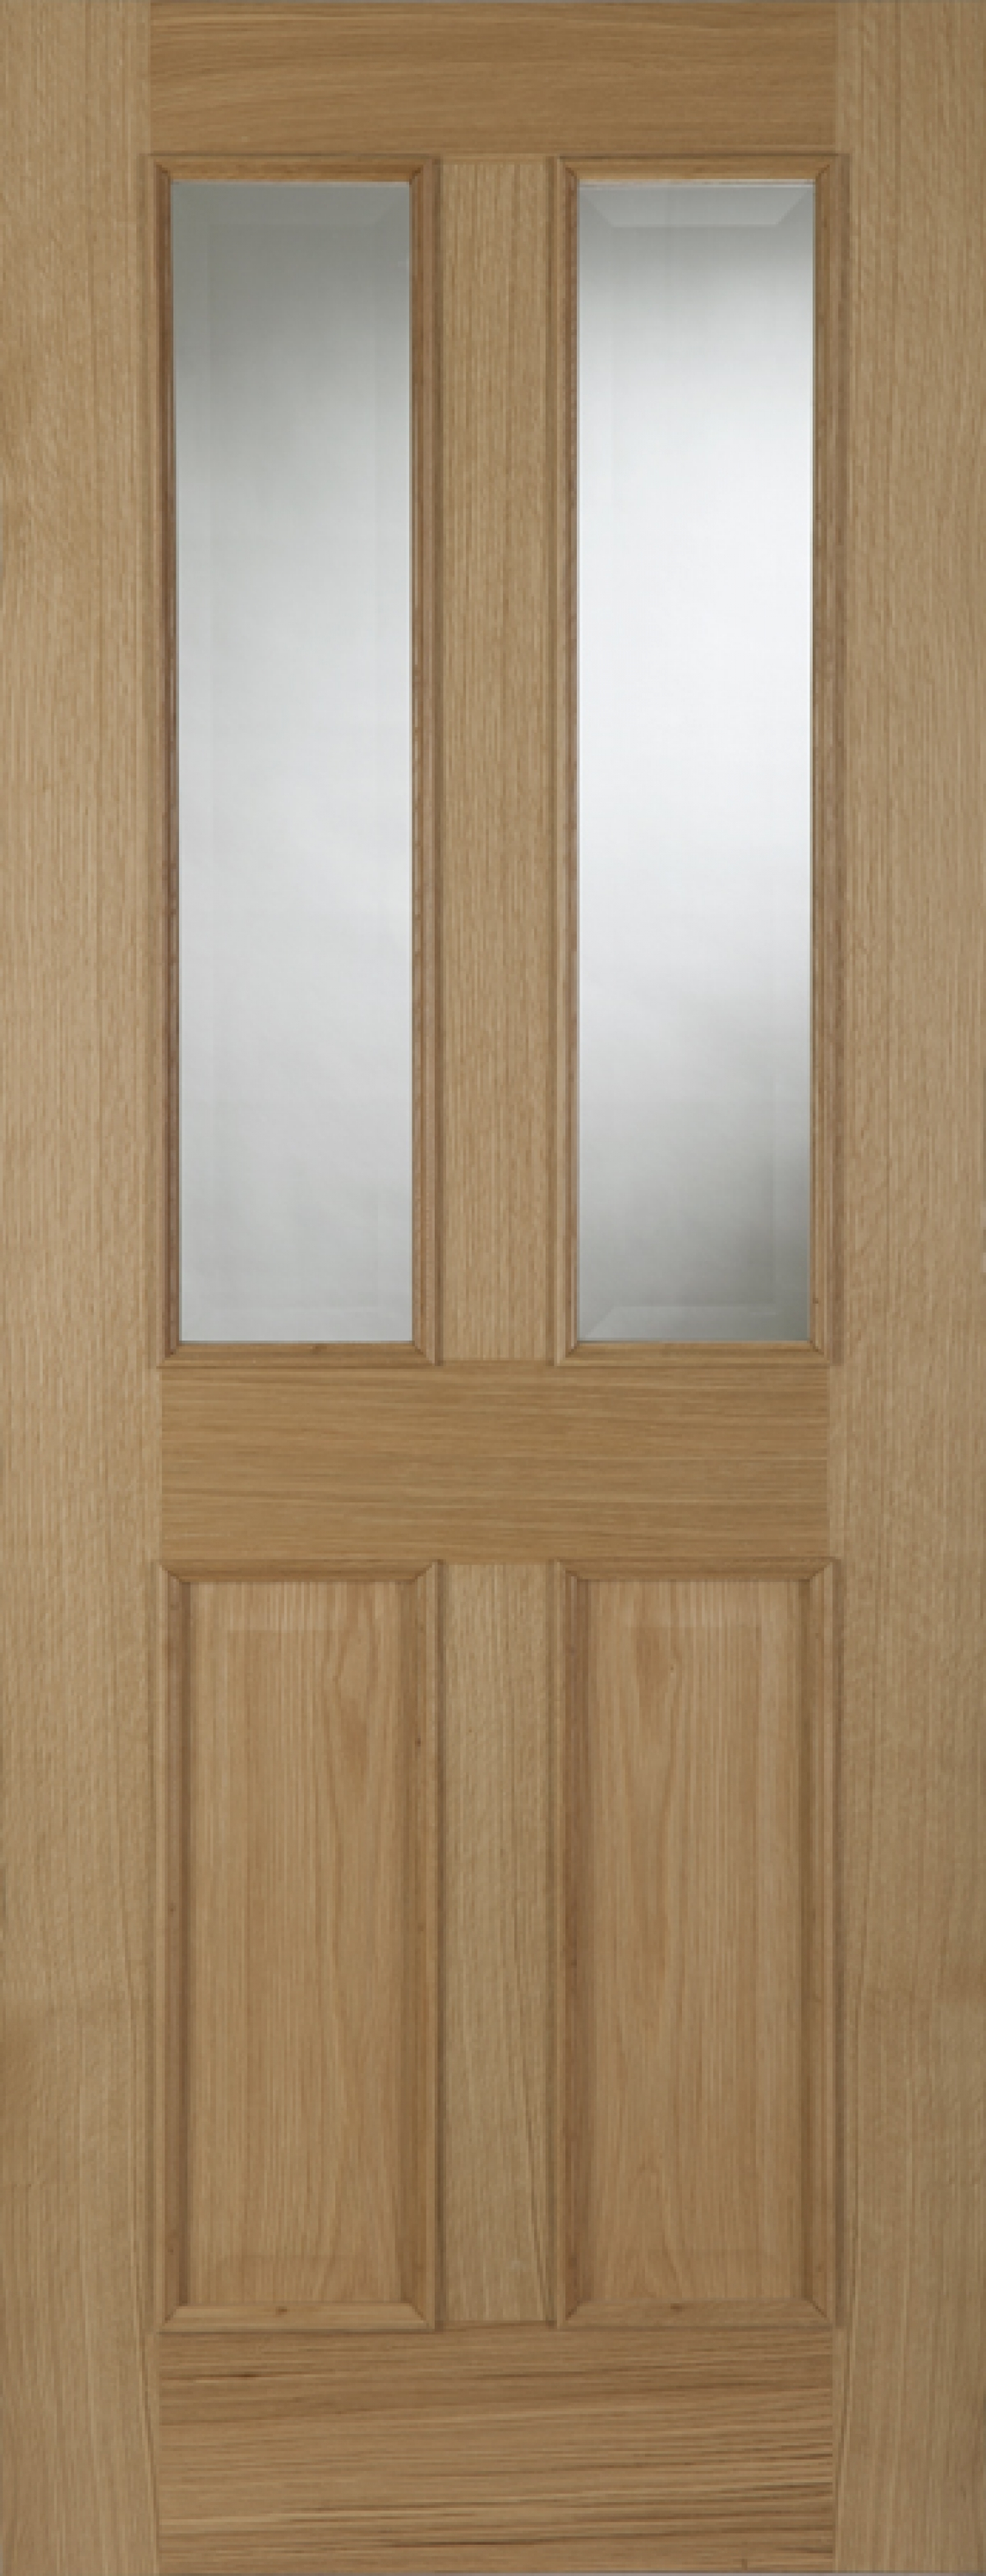 Oak Oxford 2 Light - Unglazed FD30 - RM2S